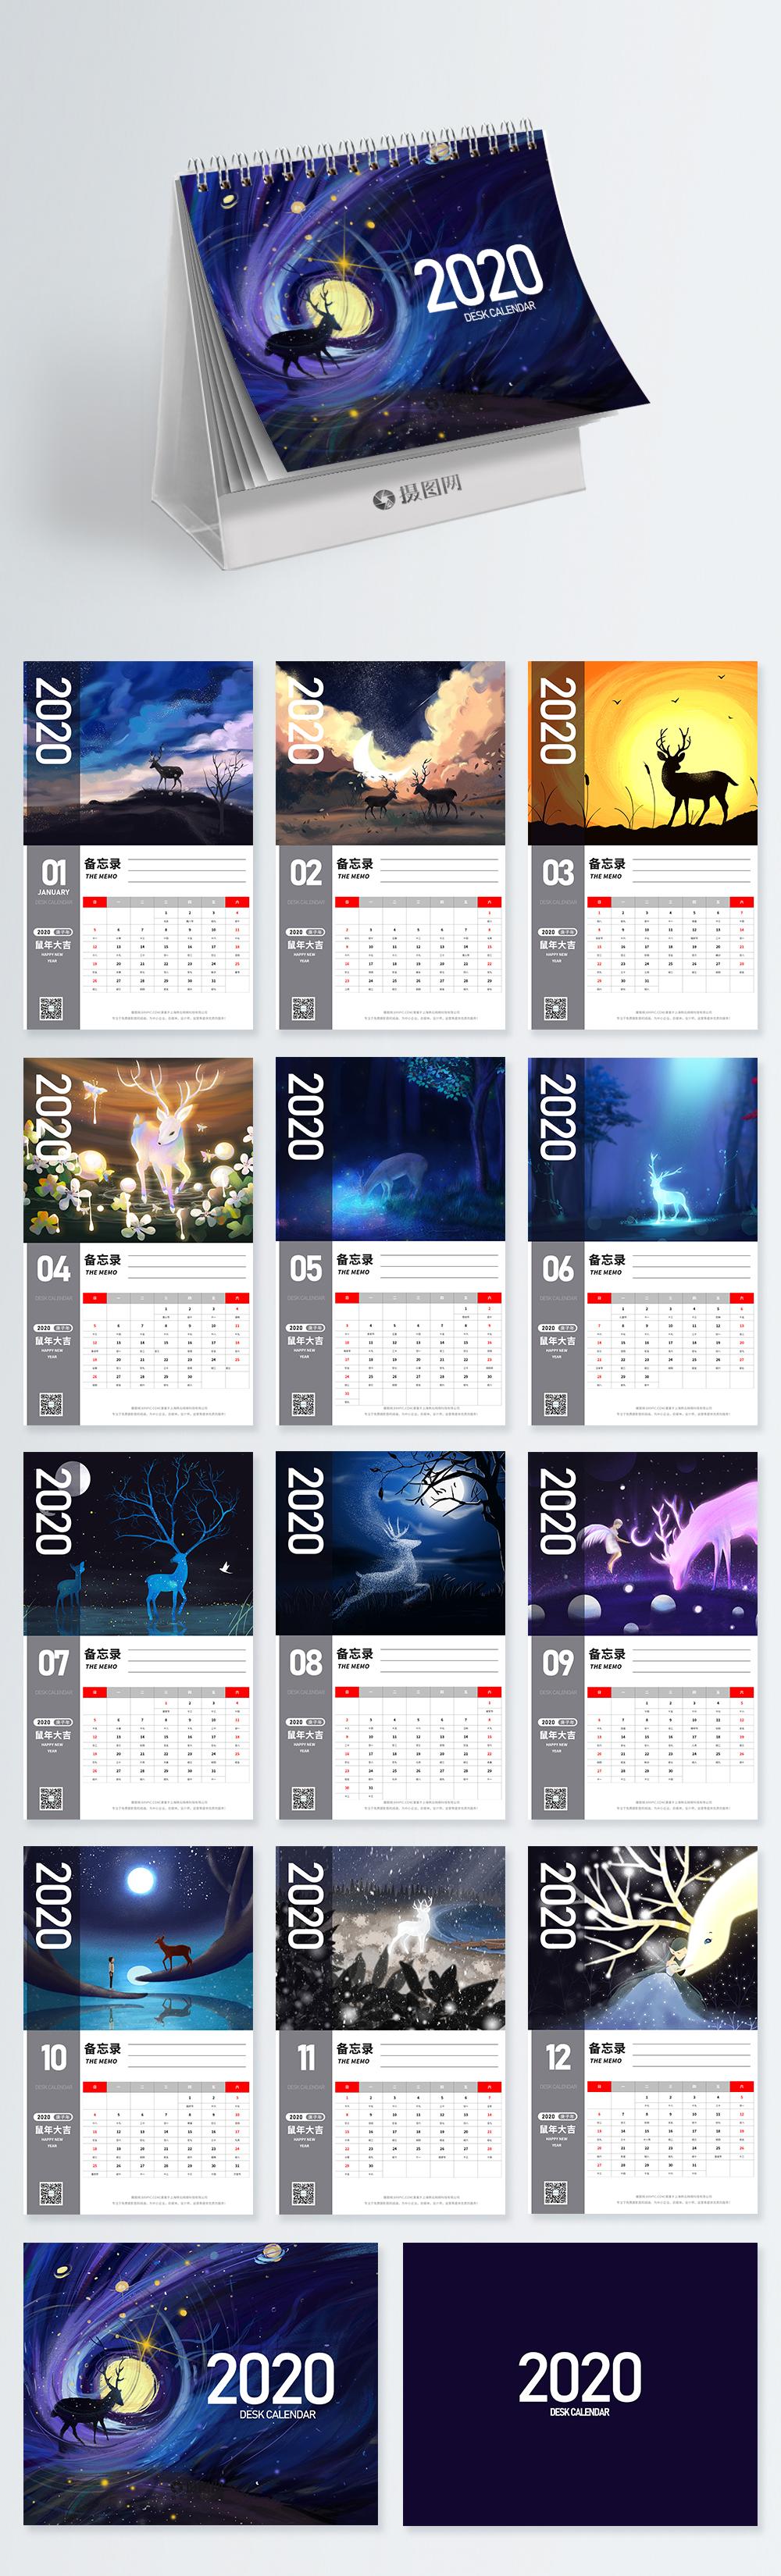 Healing Illustration Wind 2020 Rat Year Desk Calendar Design Template Image Picture Free Download 401653058 Lovepik Com